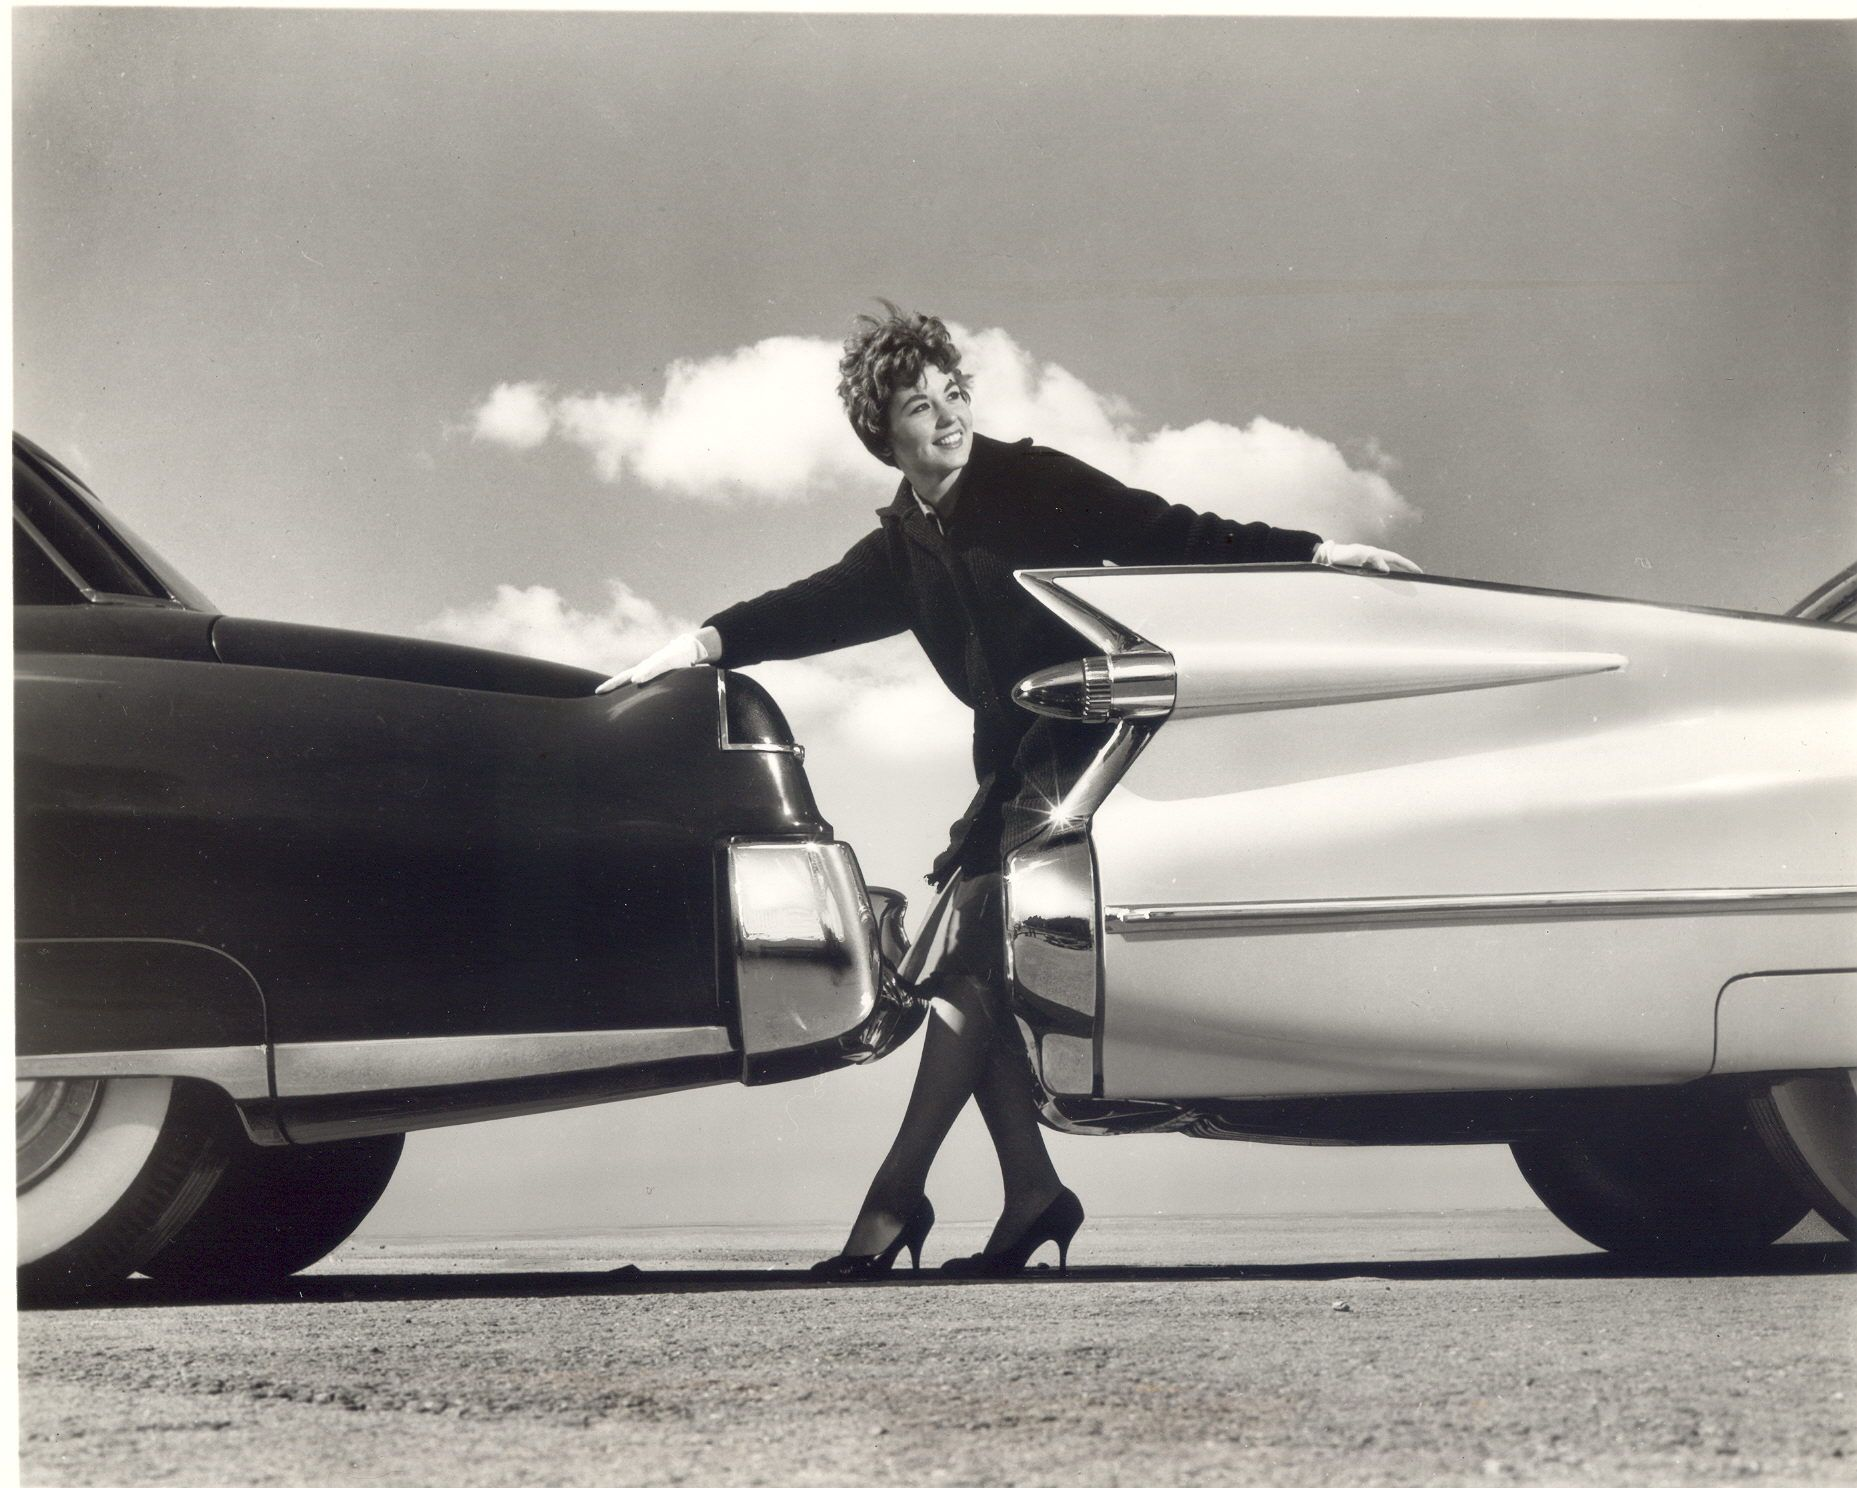 59 Cadillac Fins